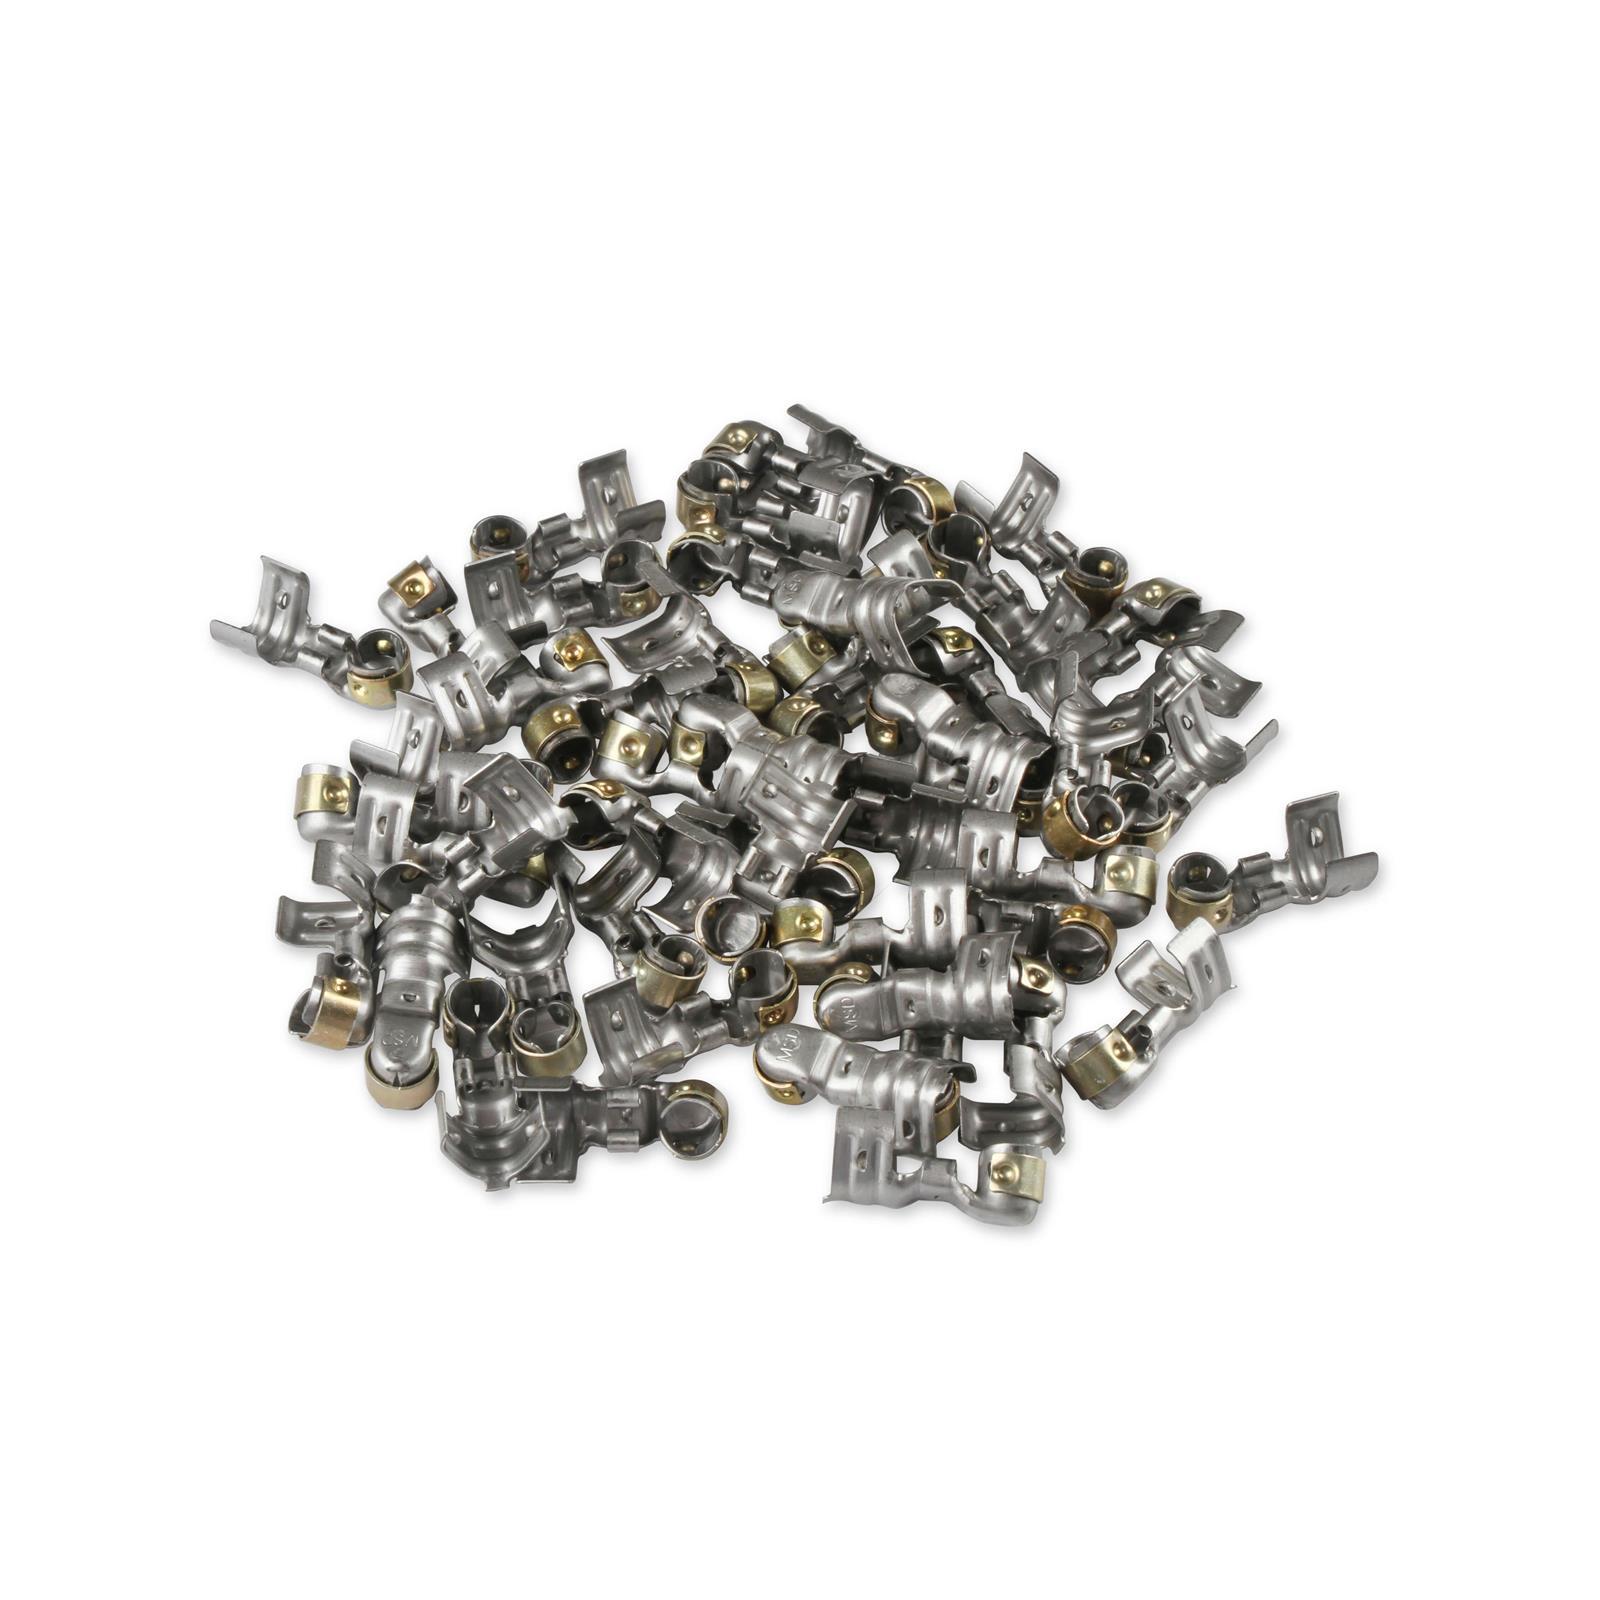 5 Steel 45 degree Spark Plug Terminals